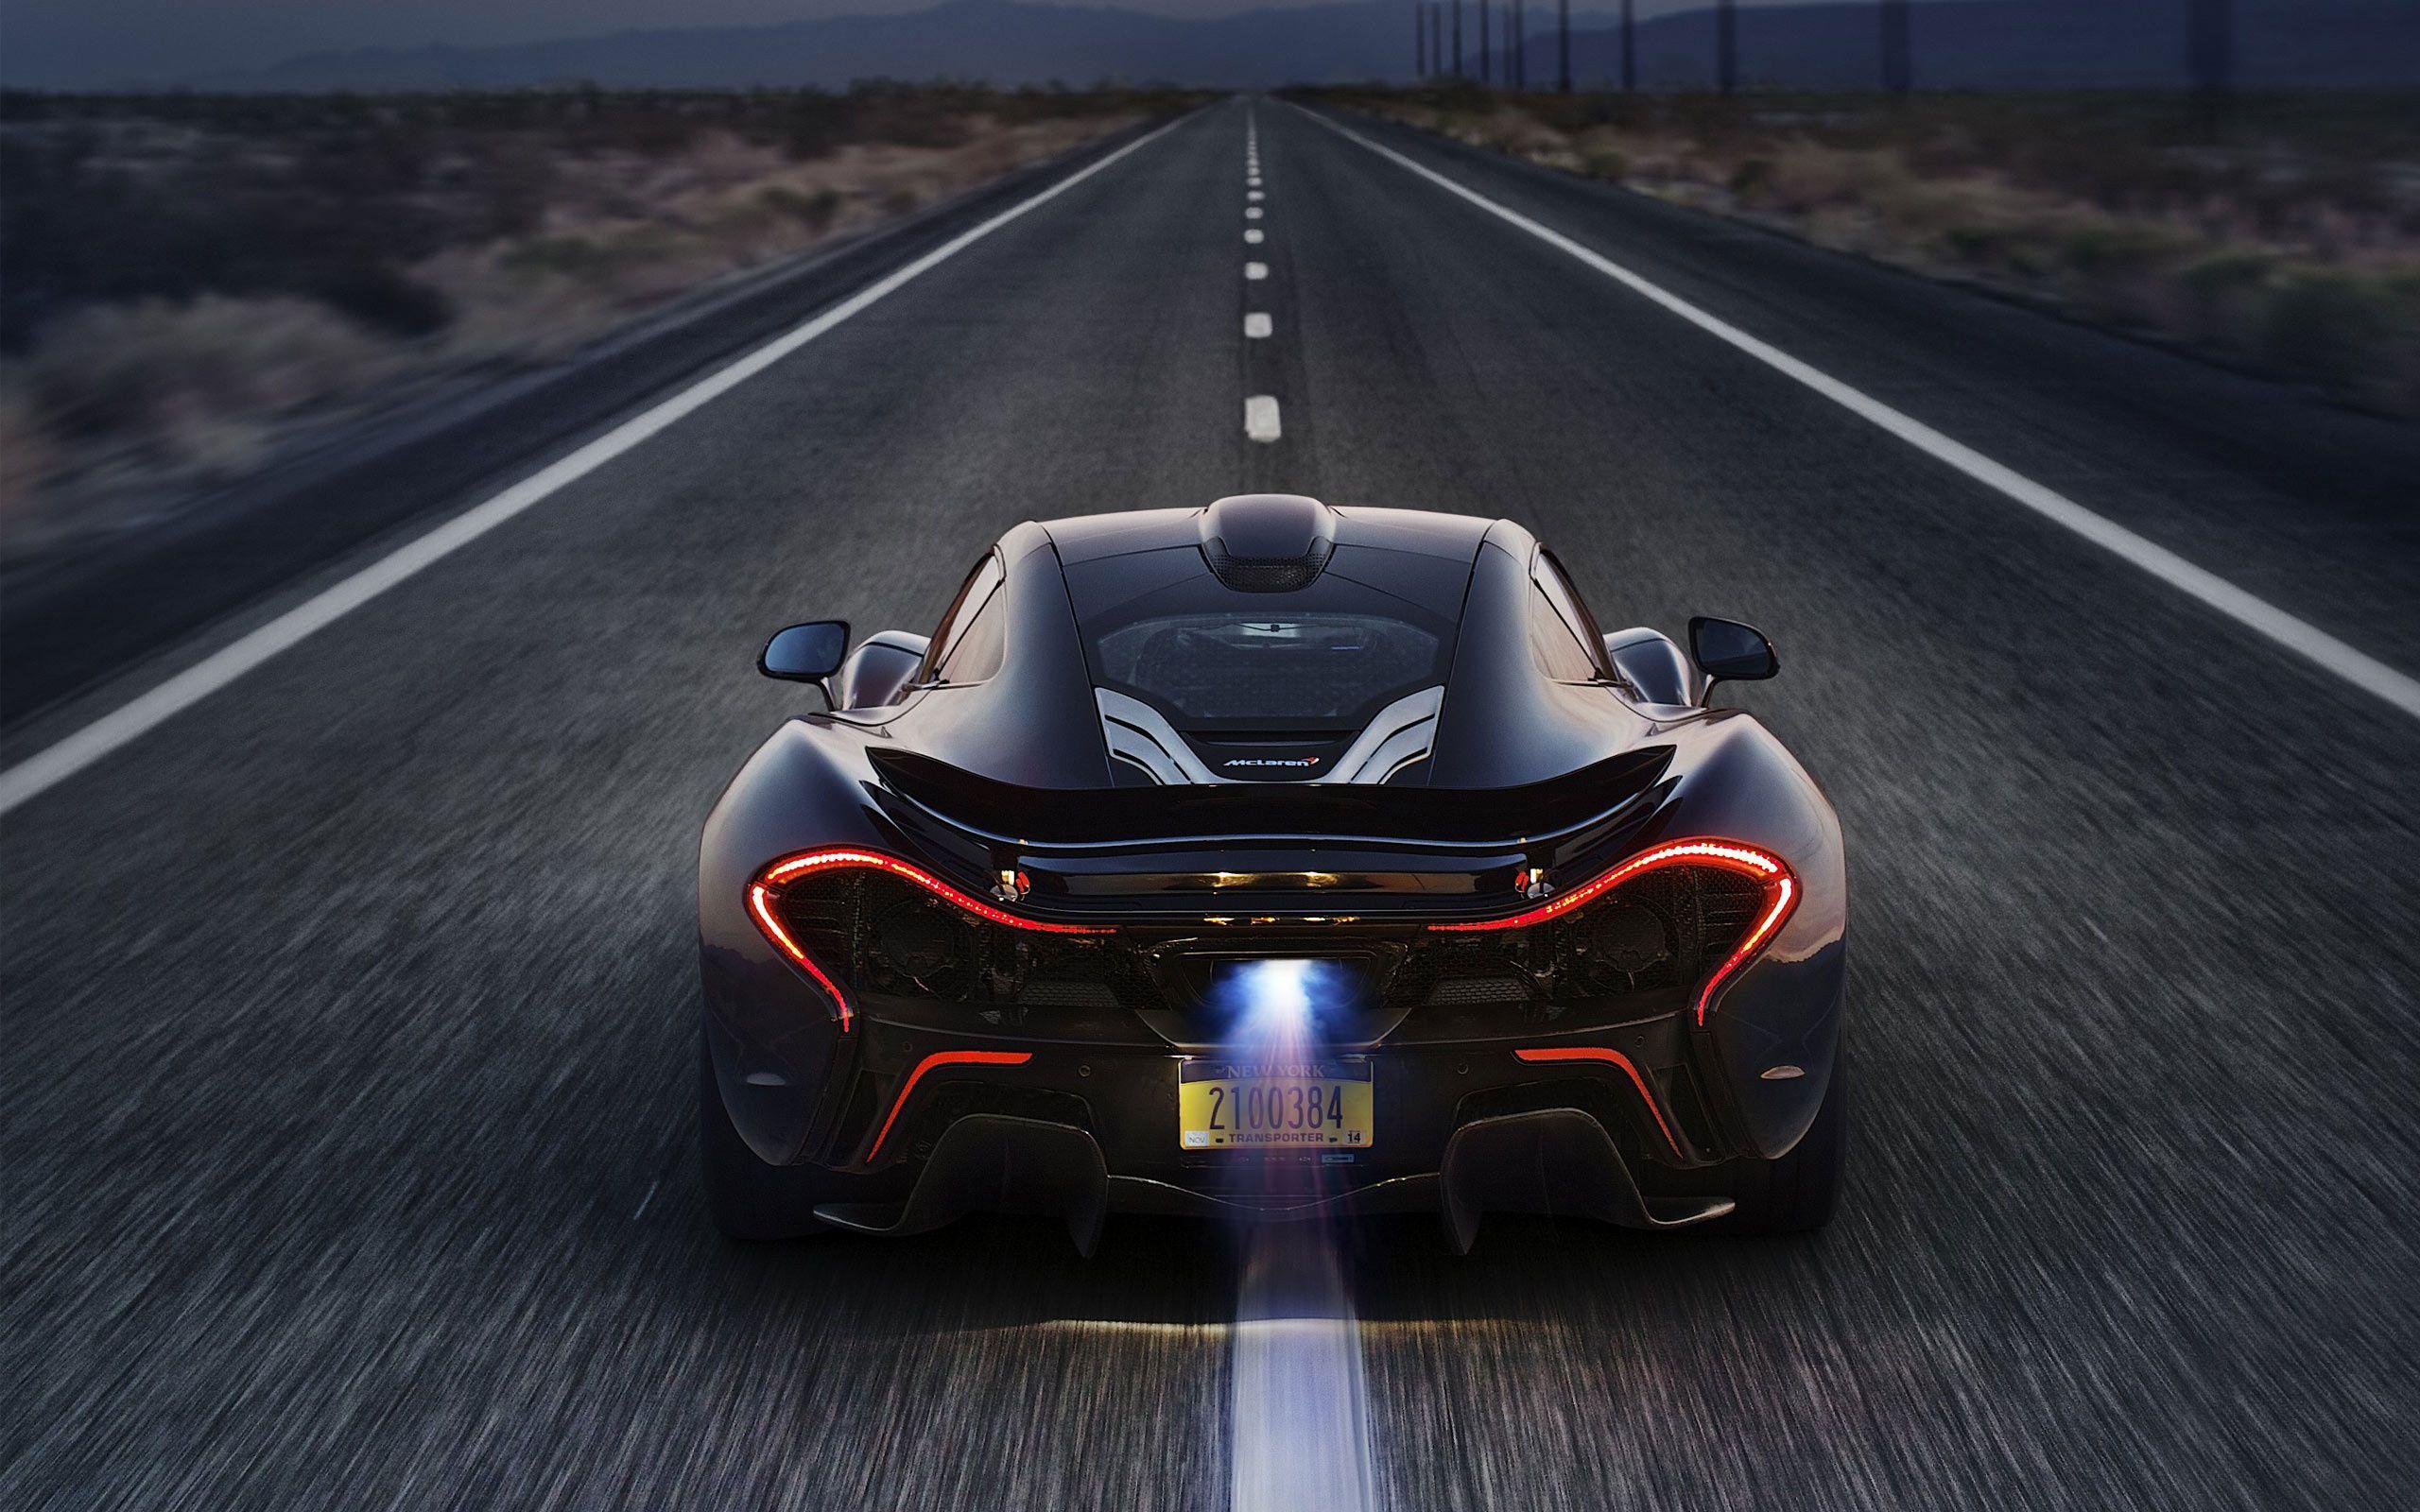 Charmant McLaren P1 Super Car Highway Wallpaper   Http://www.gbwallpapers.com